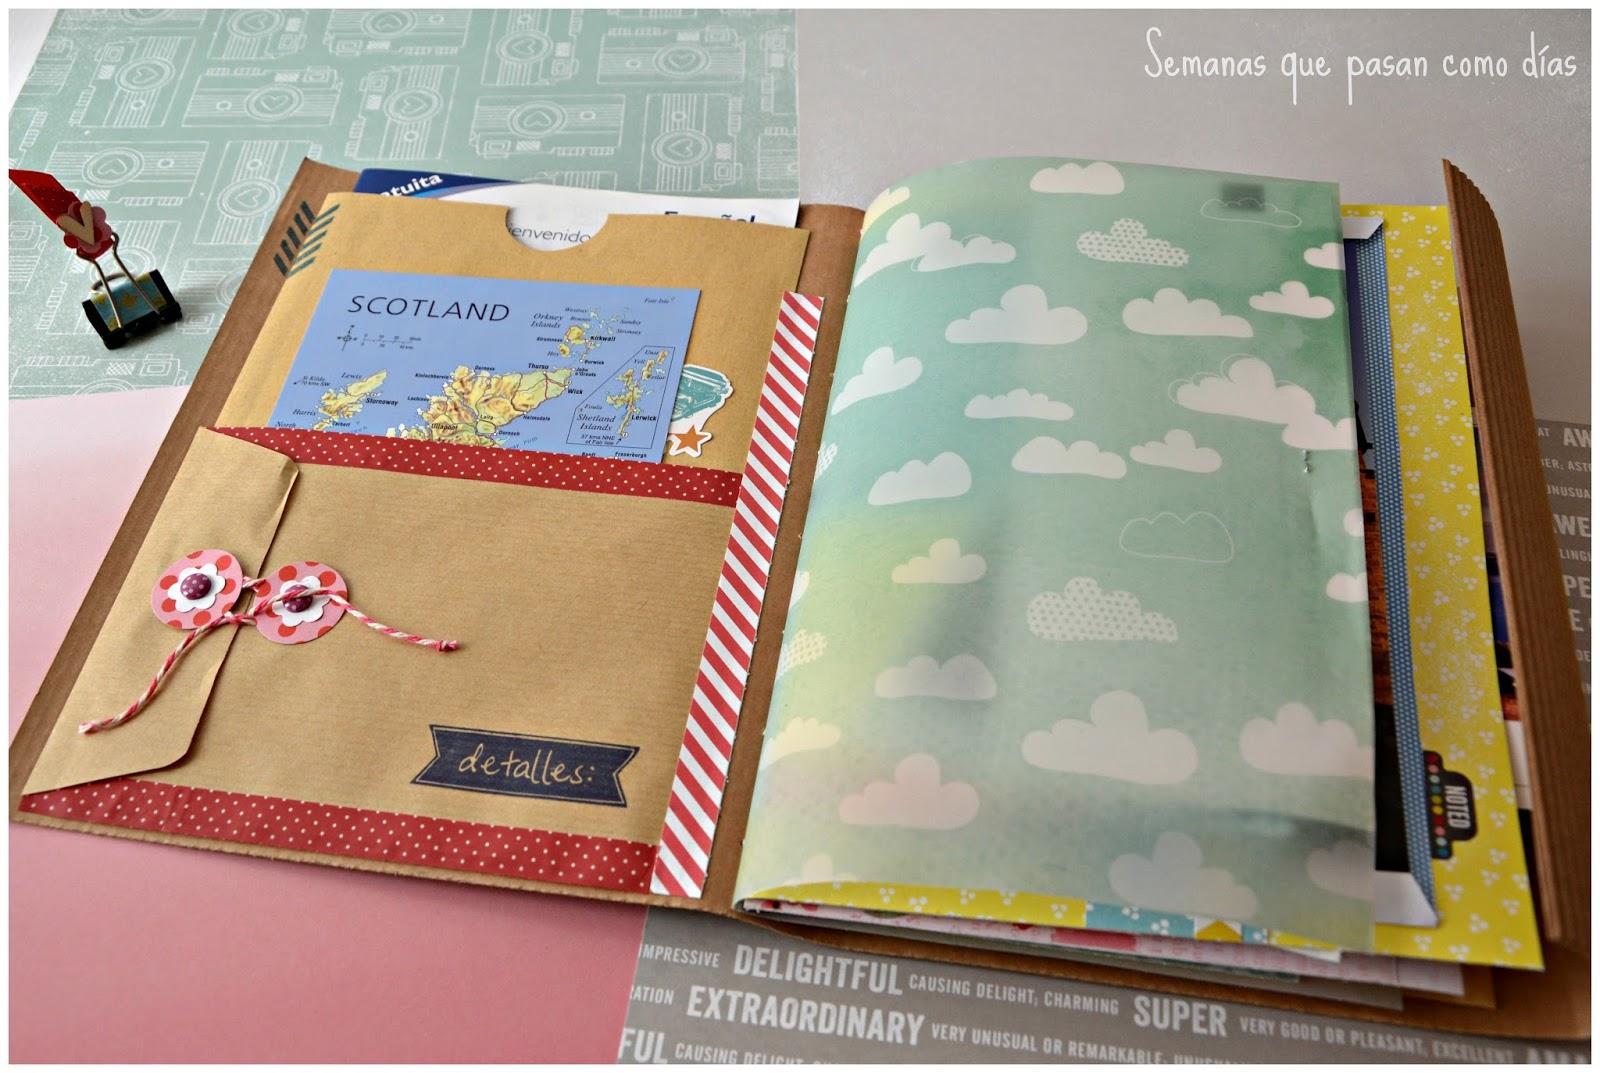 Semanas que pasan como d as viaje a escocia cuaderno lbum de viaje - Decorar album de fotos por dentro ...